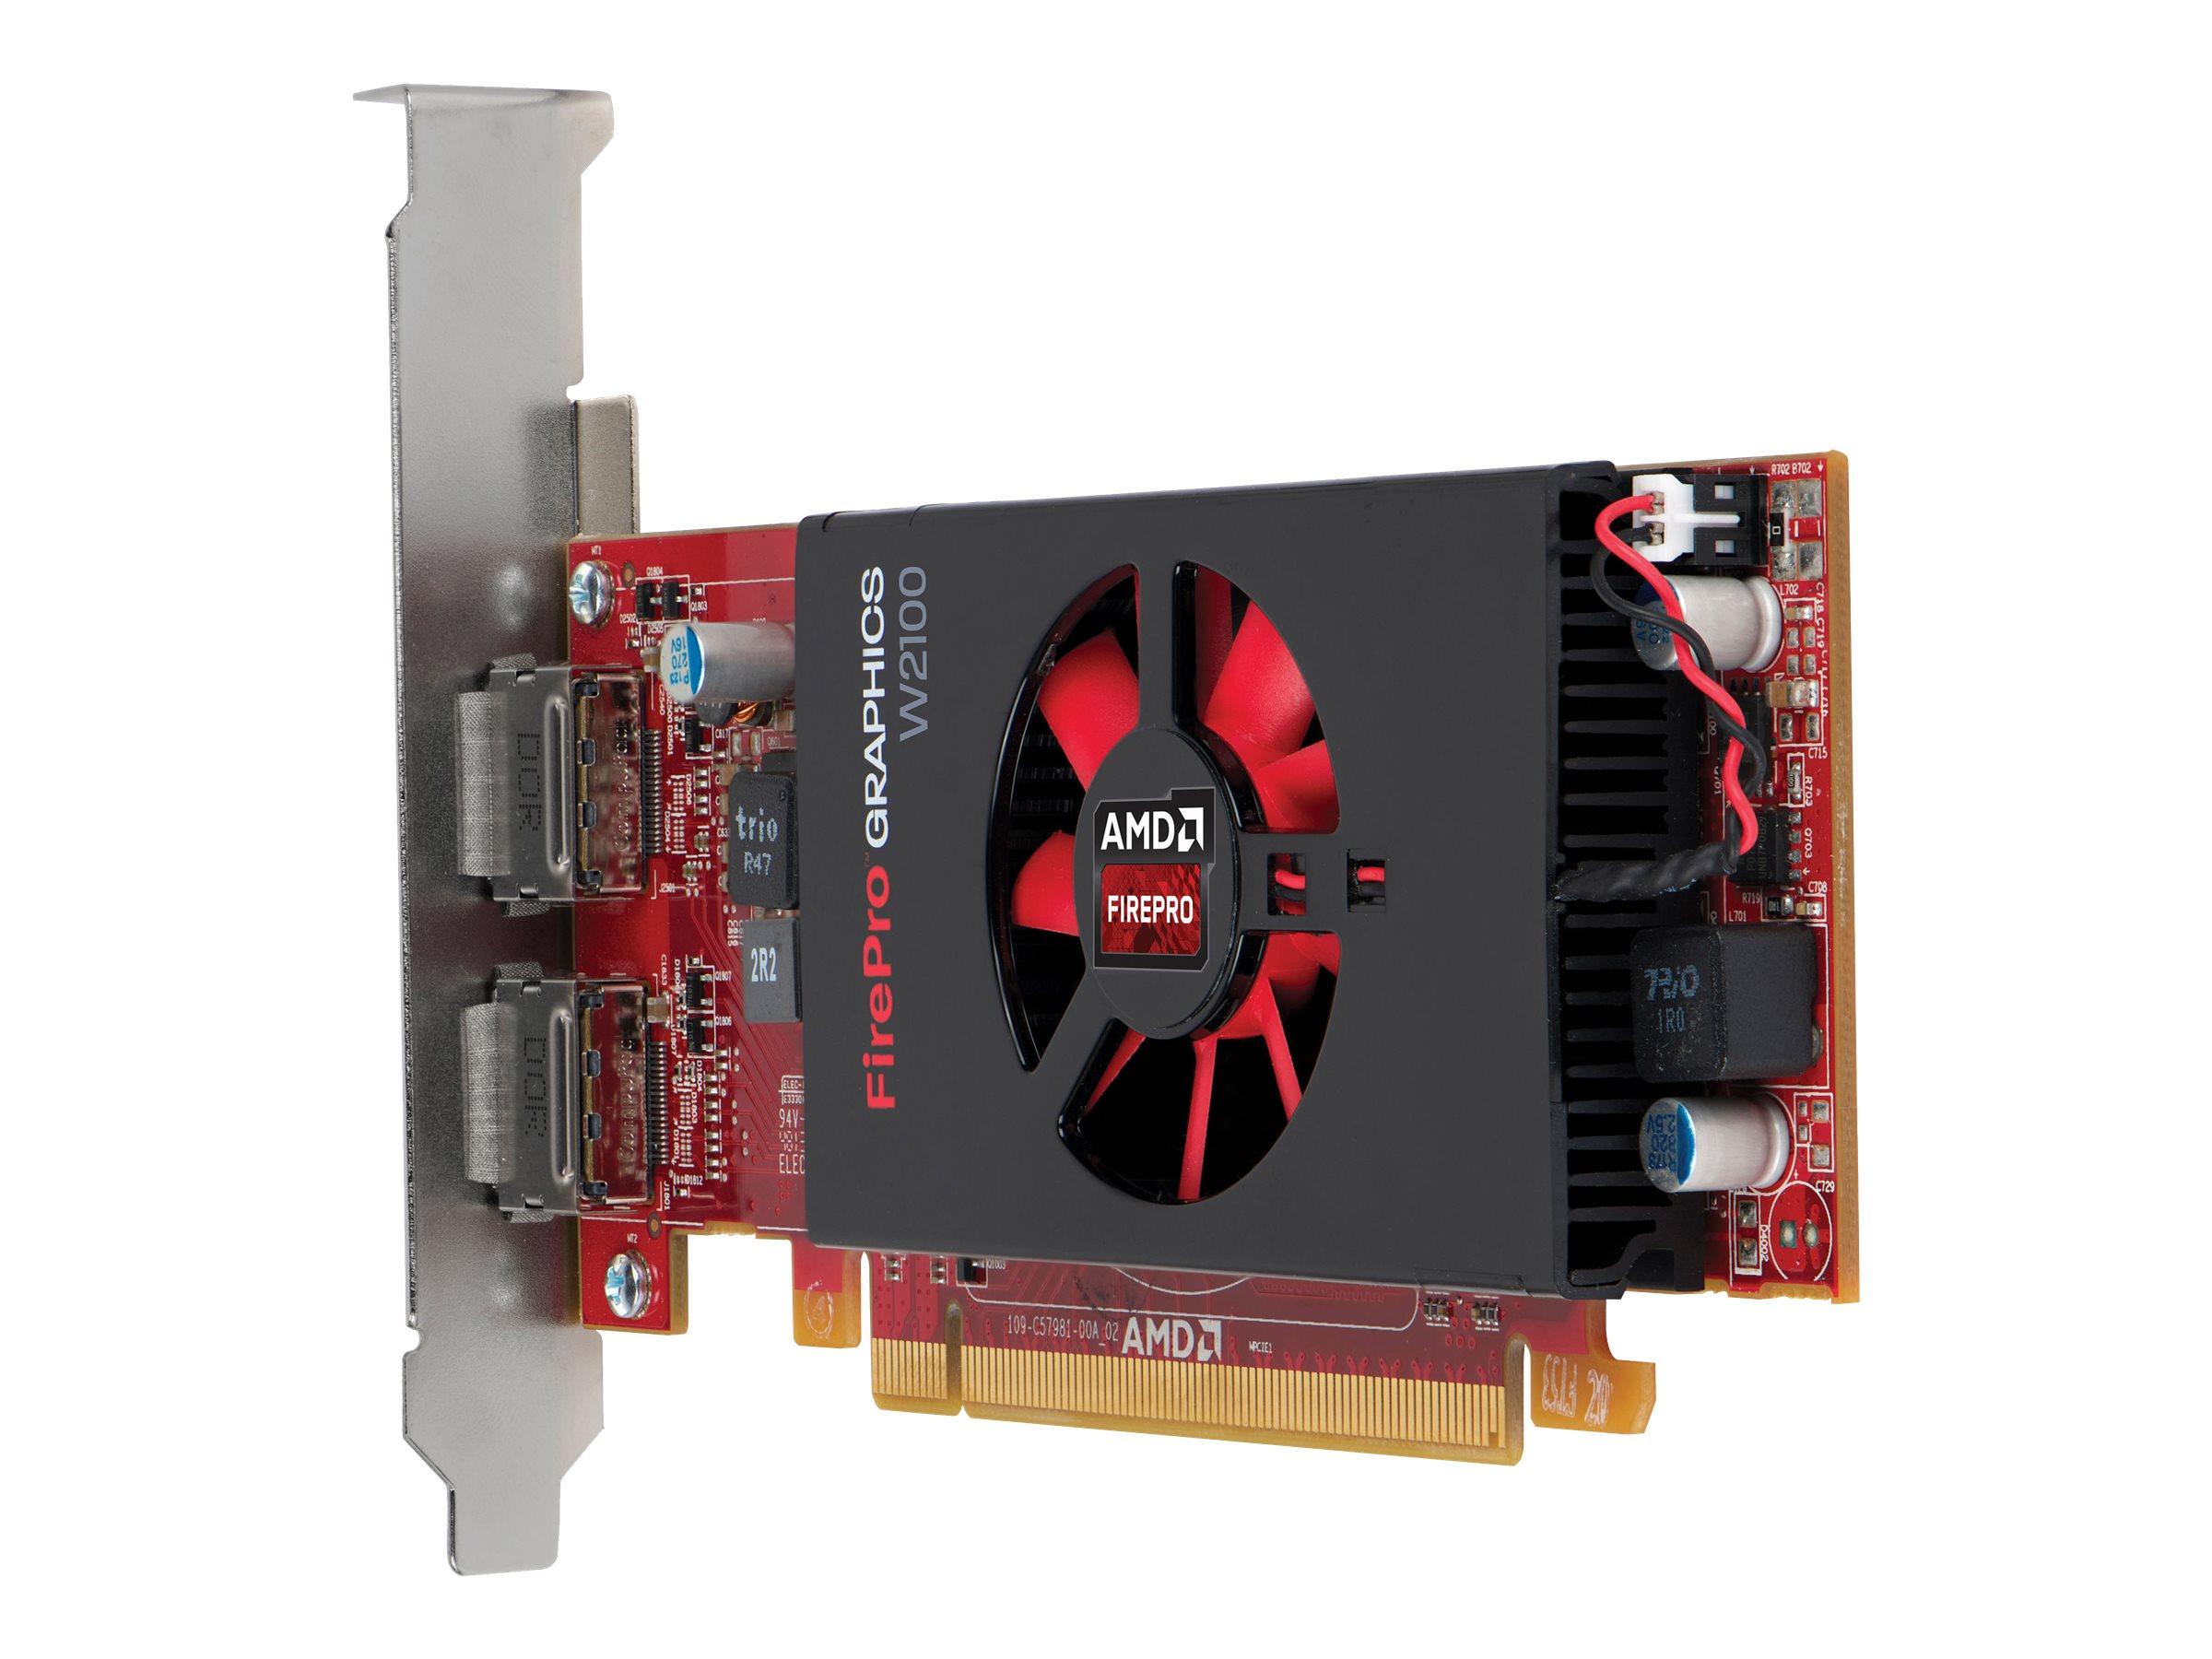 AMD FirePro W2100 - Grafikkarten - FirePro W2100 - 2 GB DDR3 - PCIe 3.0 x8 Low-Profile - 2 x DisplayPort